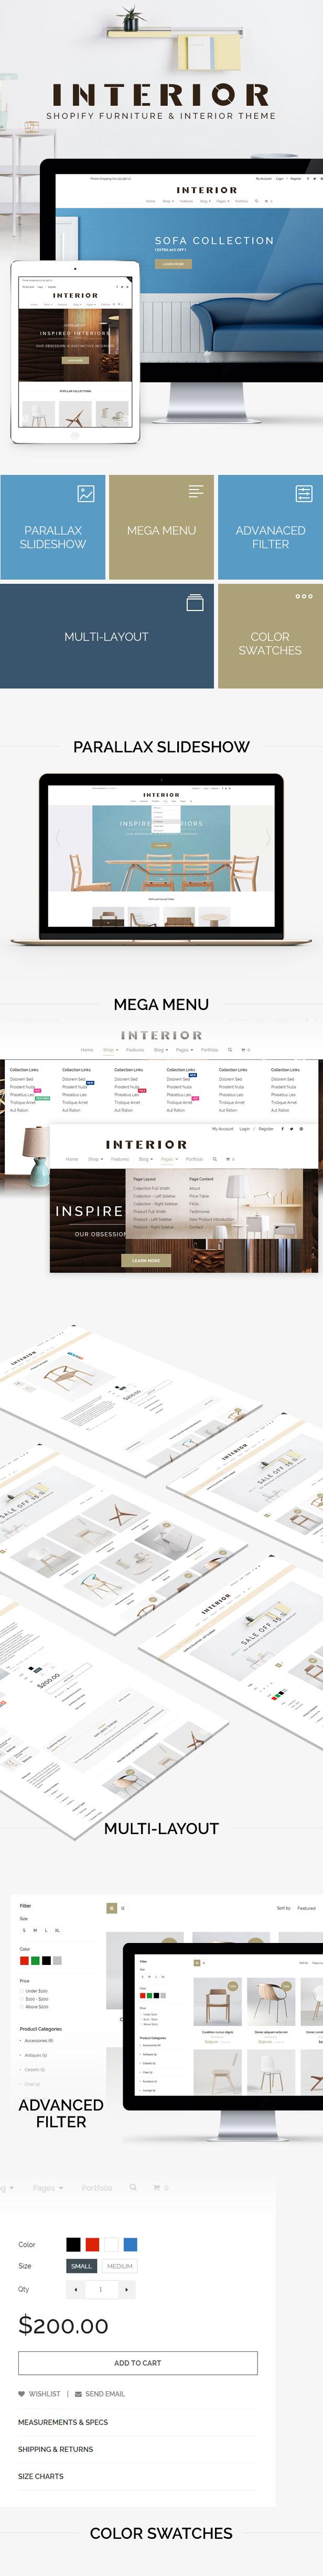 Minimalist Interior & Furniture Shopify Theme Responsive Minimalist Shopify Theme for Interior